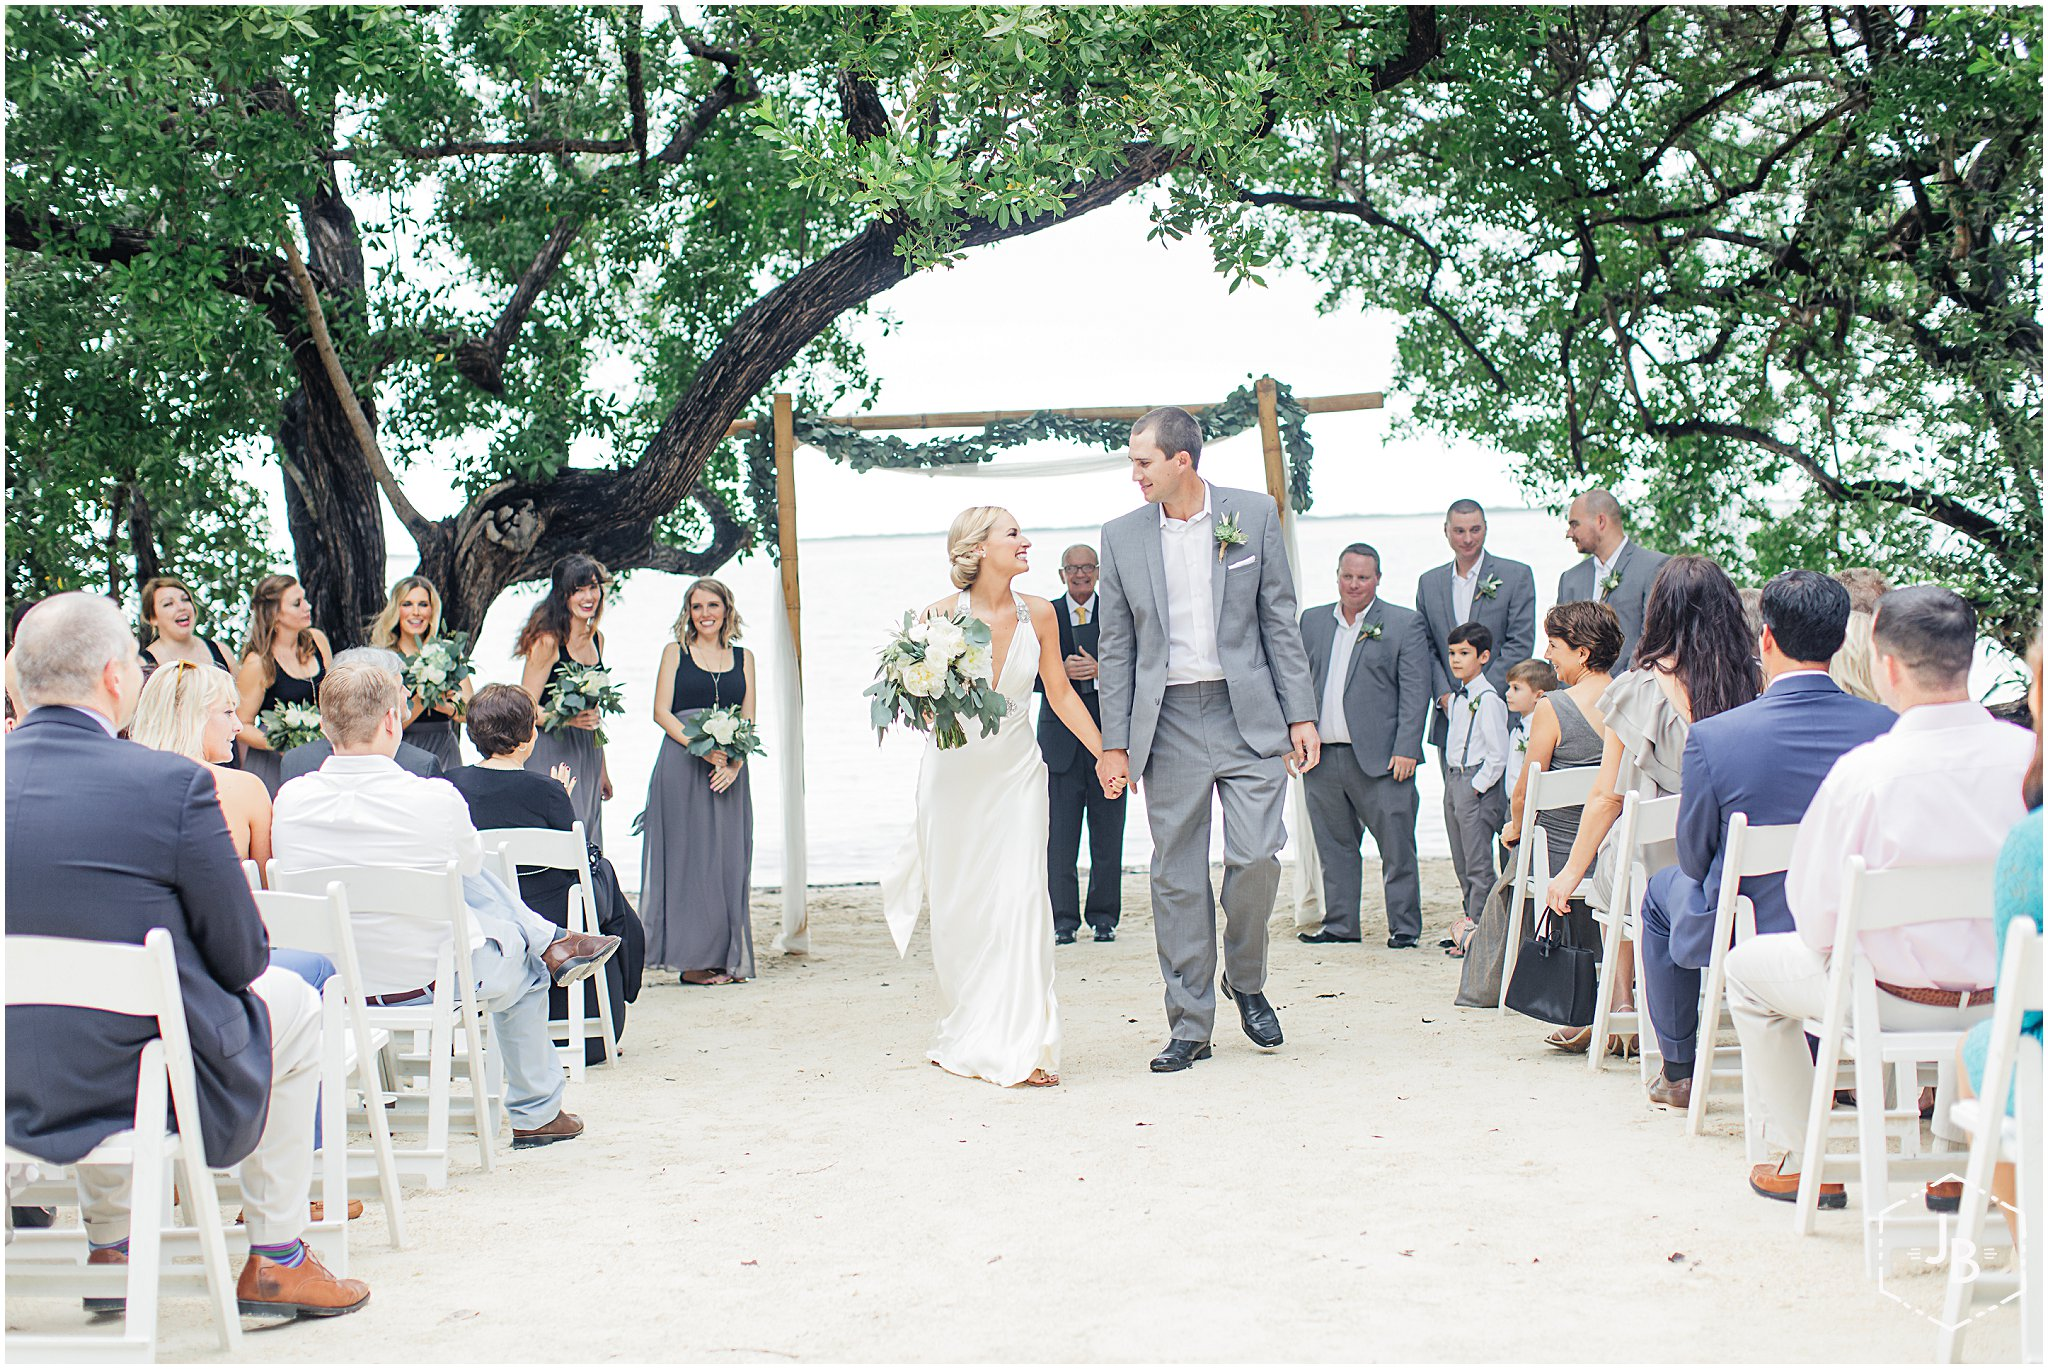 WeddingandEngagementFloridaPhotographer_1132.jpg